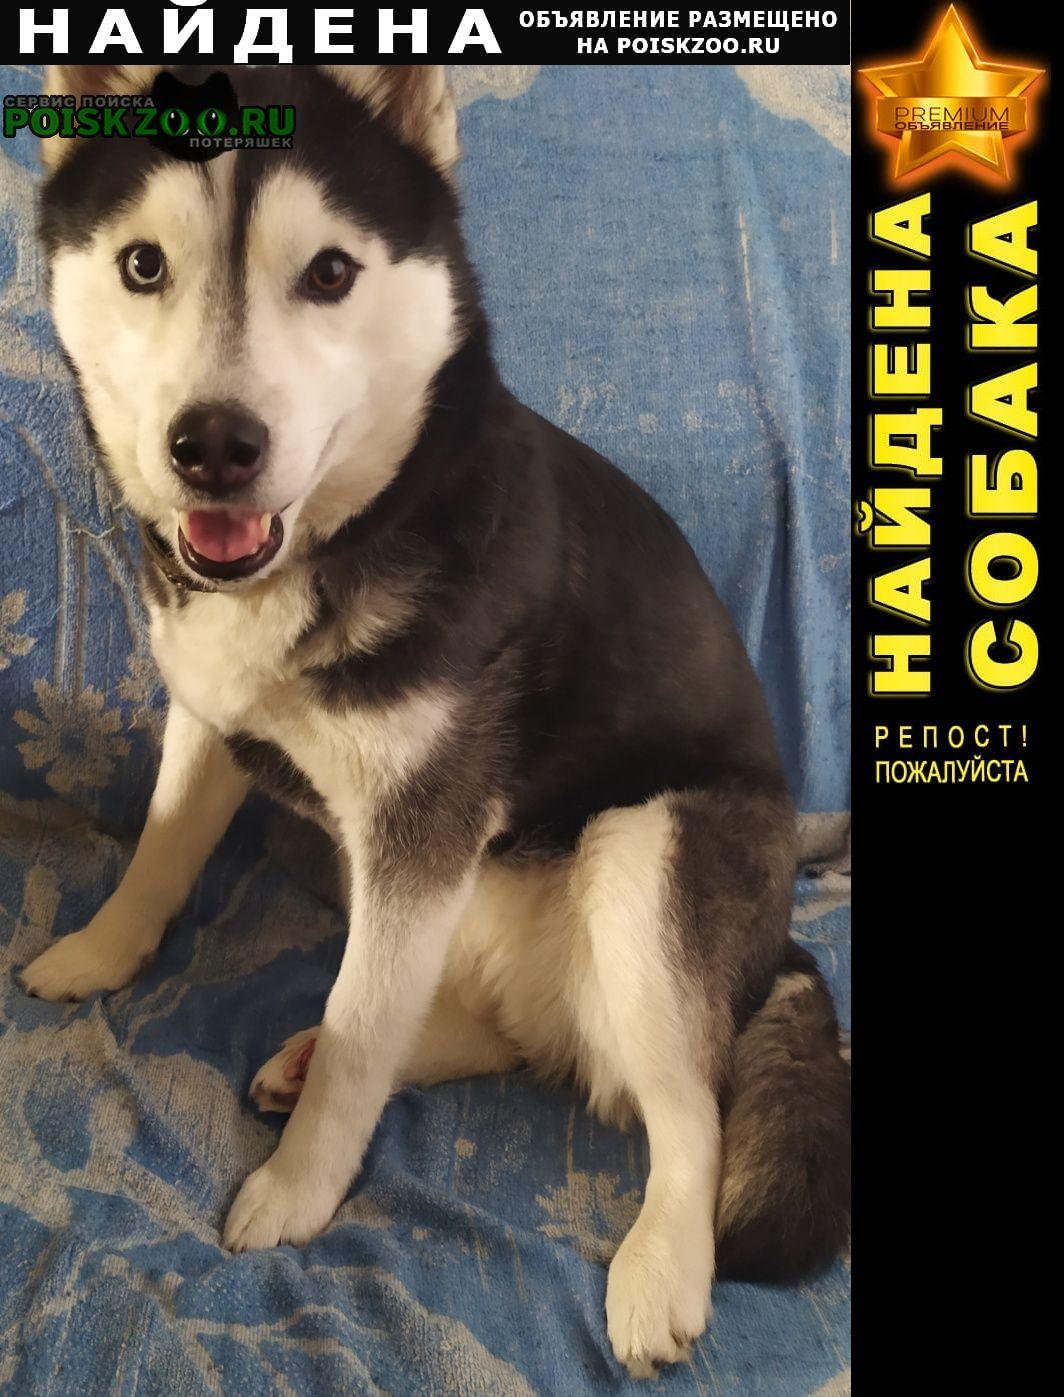 Найдена собака срочно ищем хозяев Томск